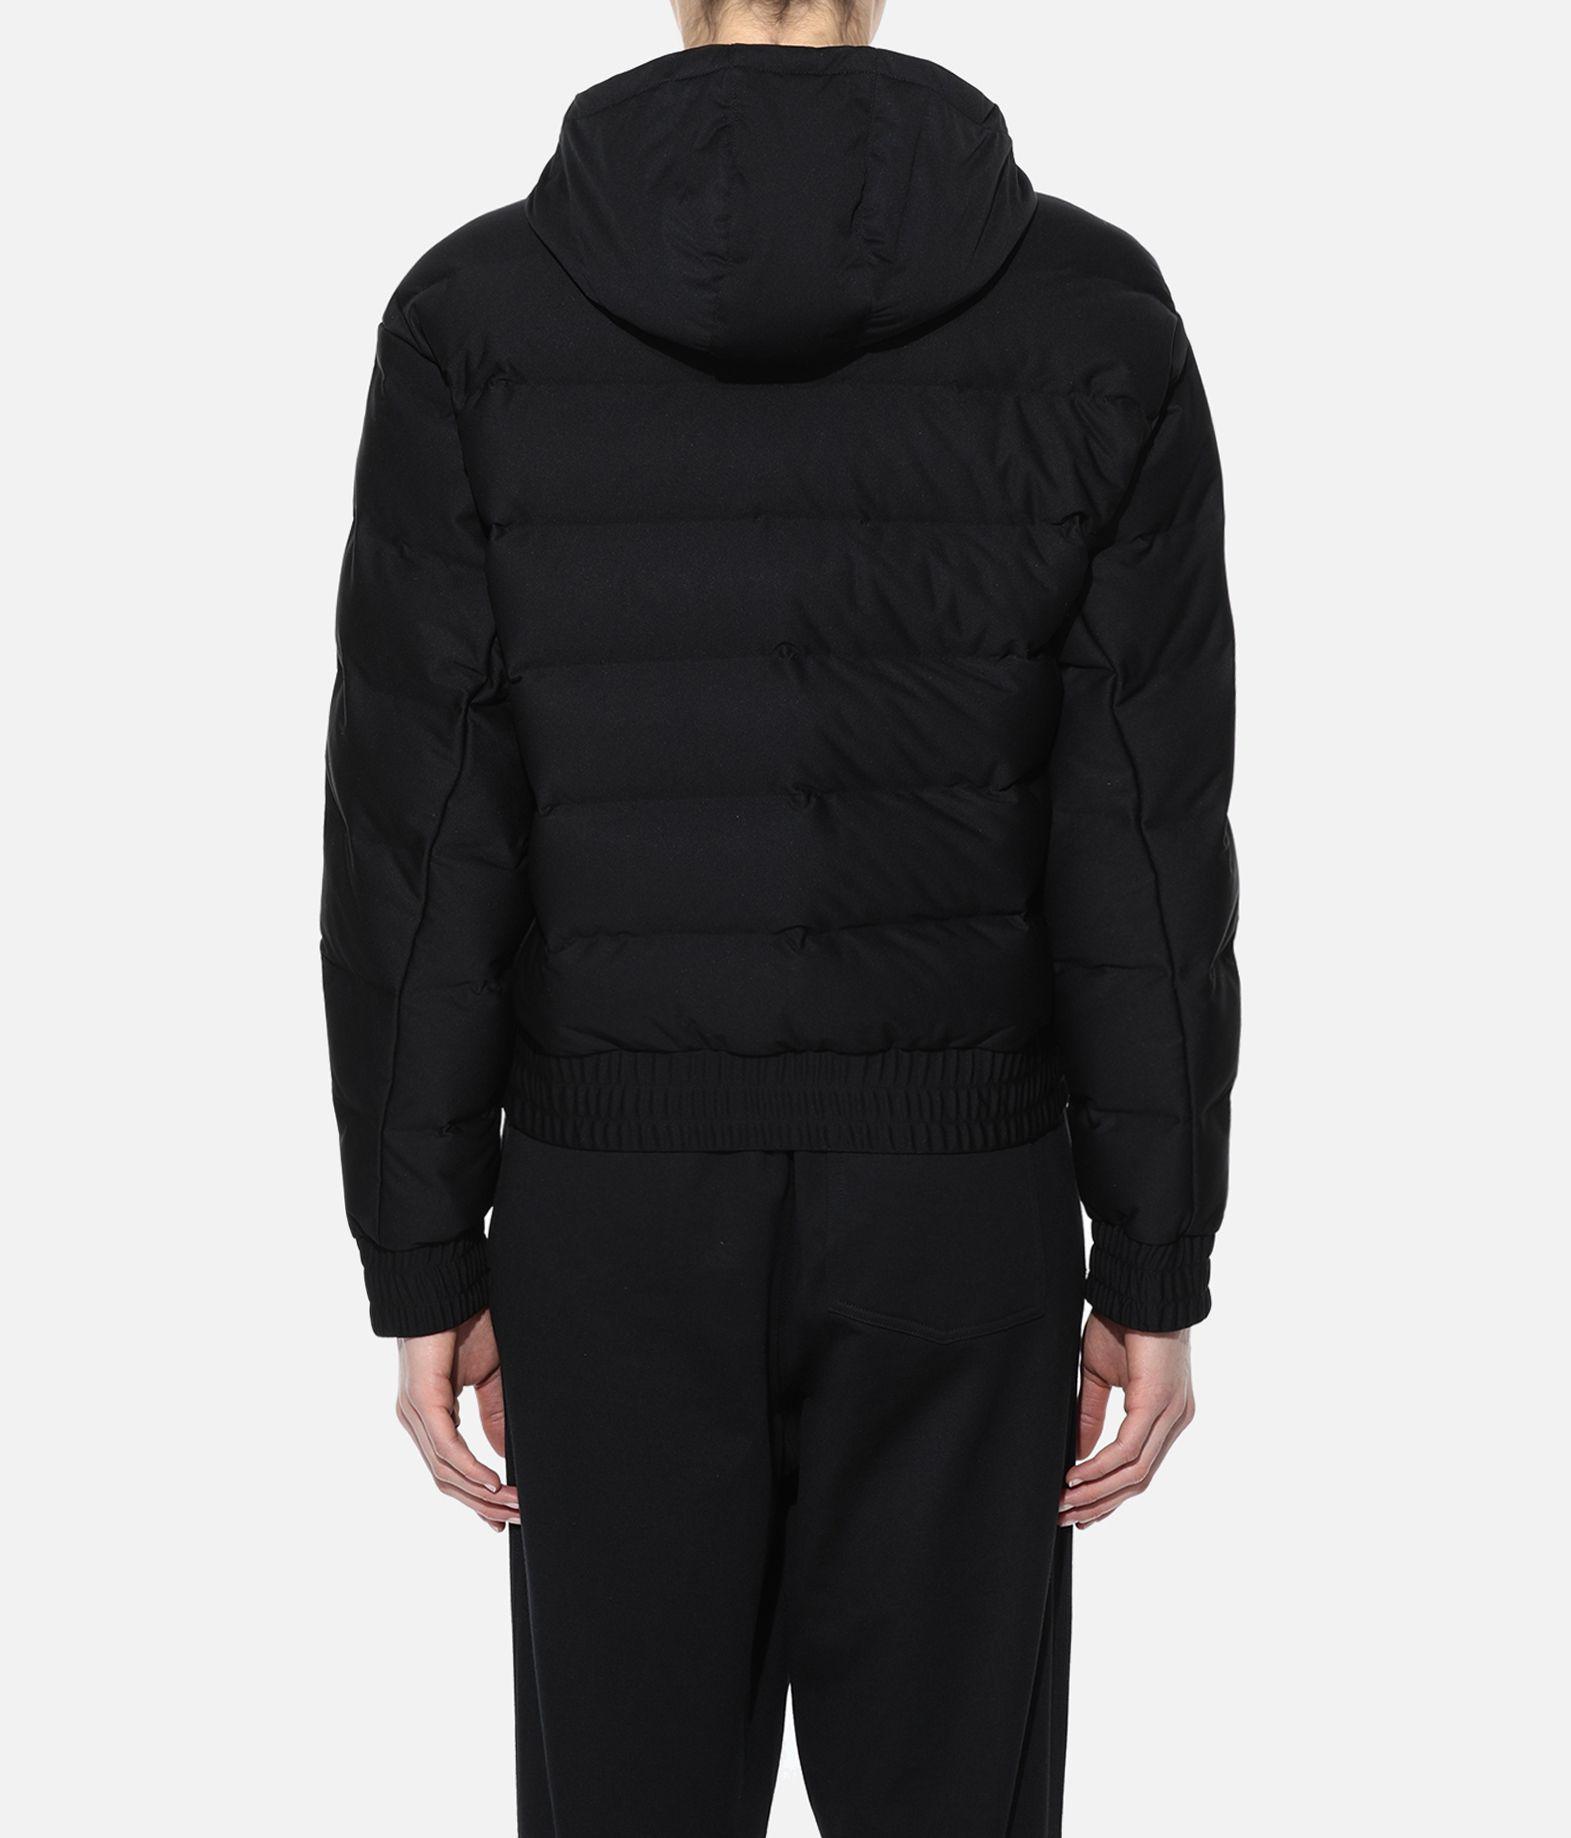 Y-3 Y-3 Seamless Down Hooded Jacket Jacket Woman d